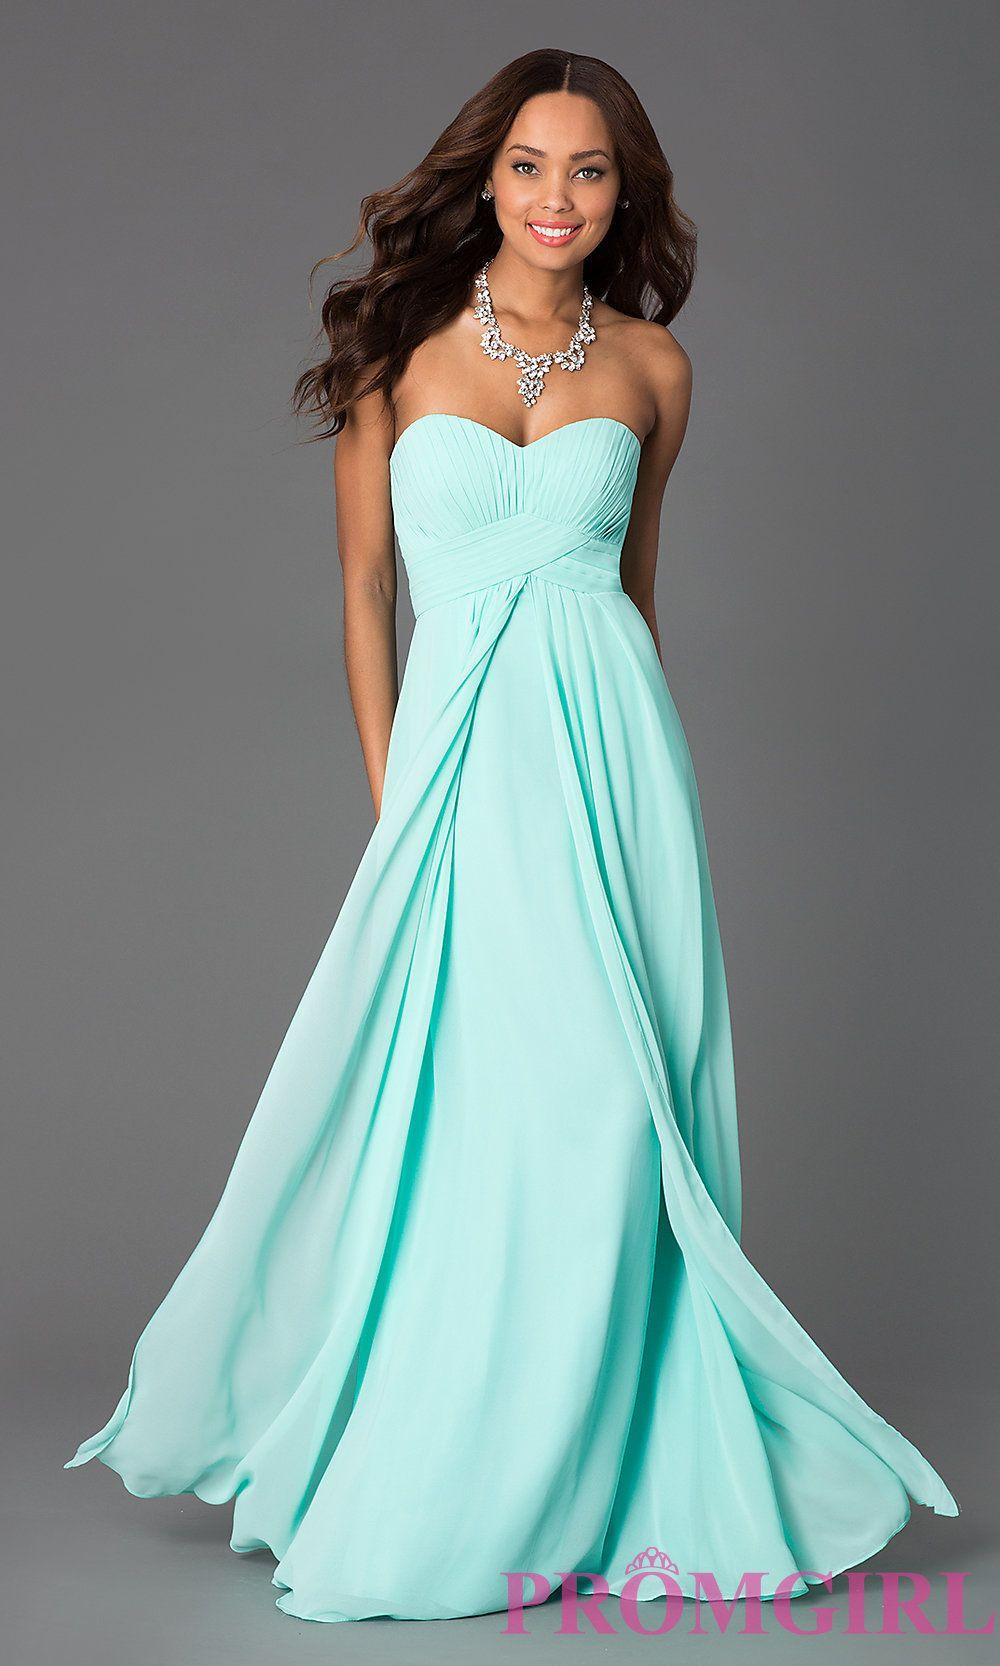 http://www.promgirl.com/shop/dresses/viewitem-PD1211231?utm_source ...